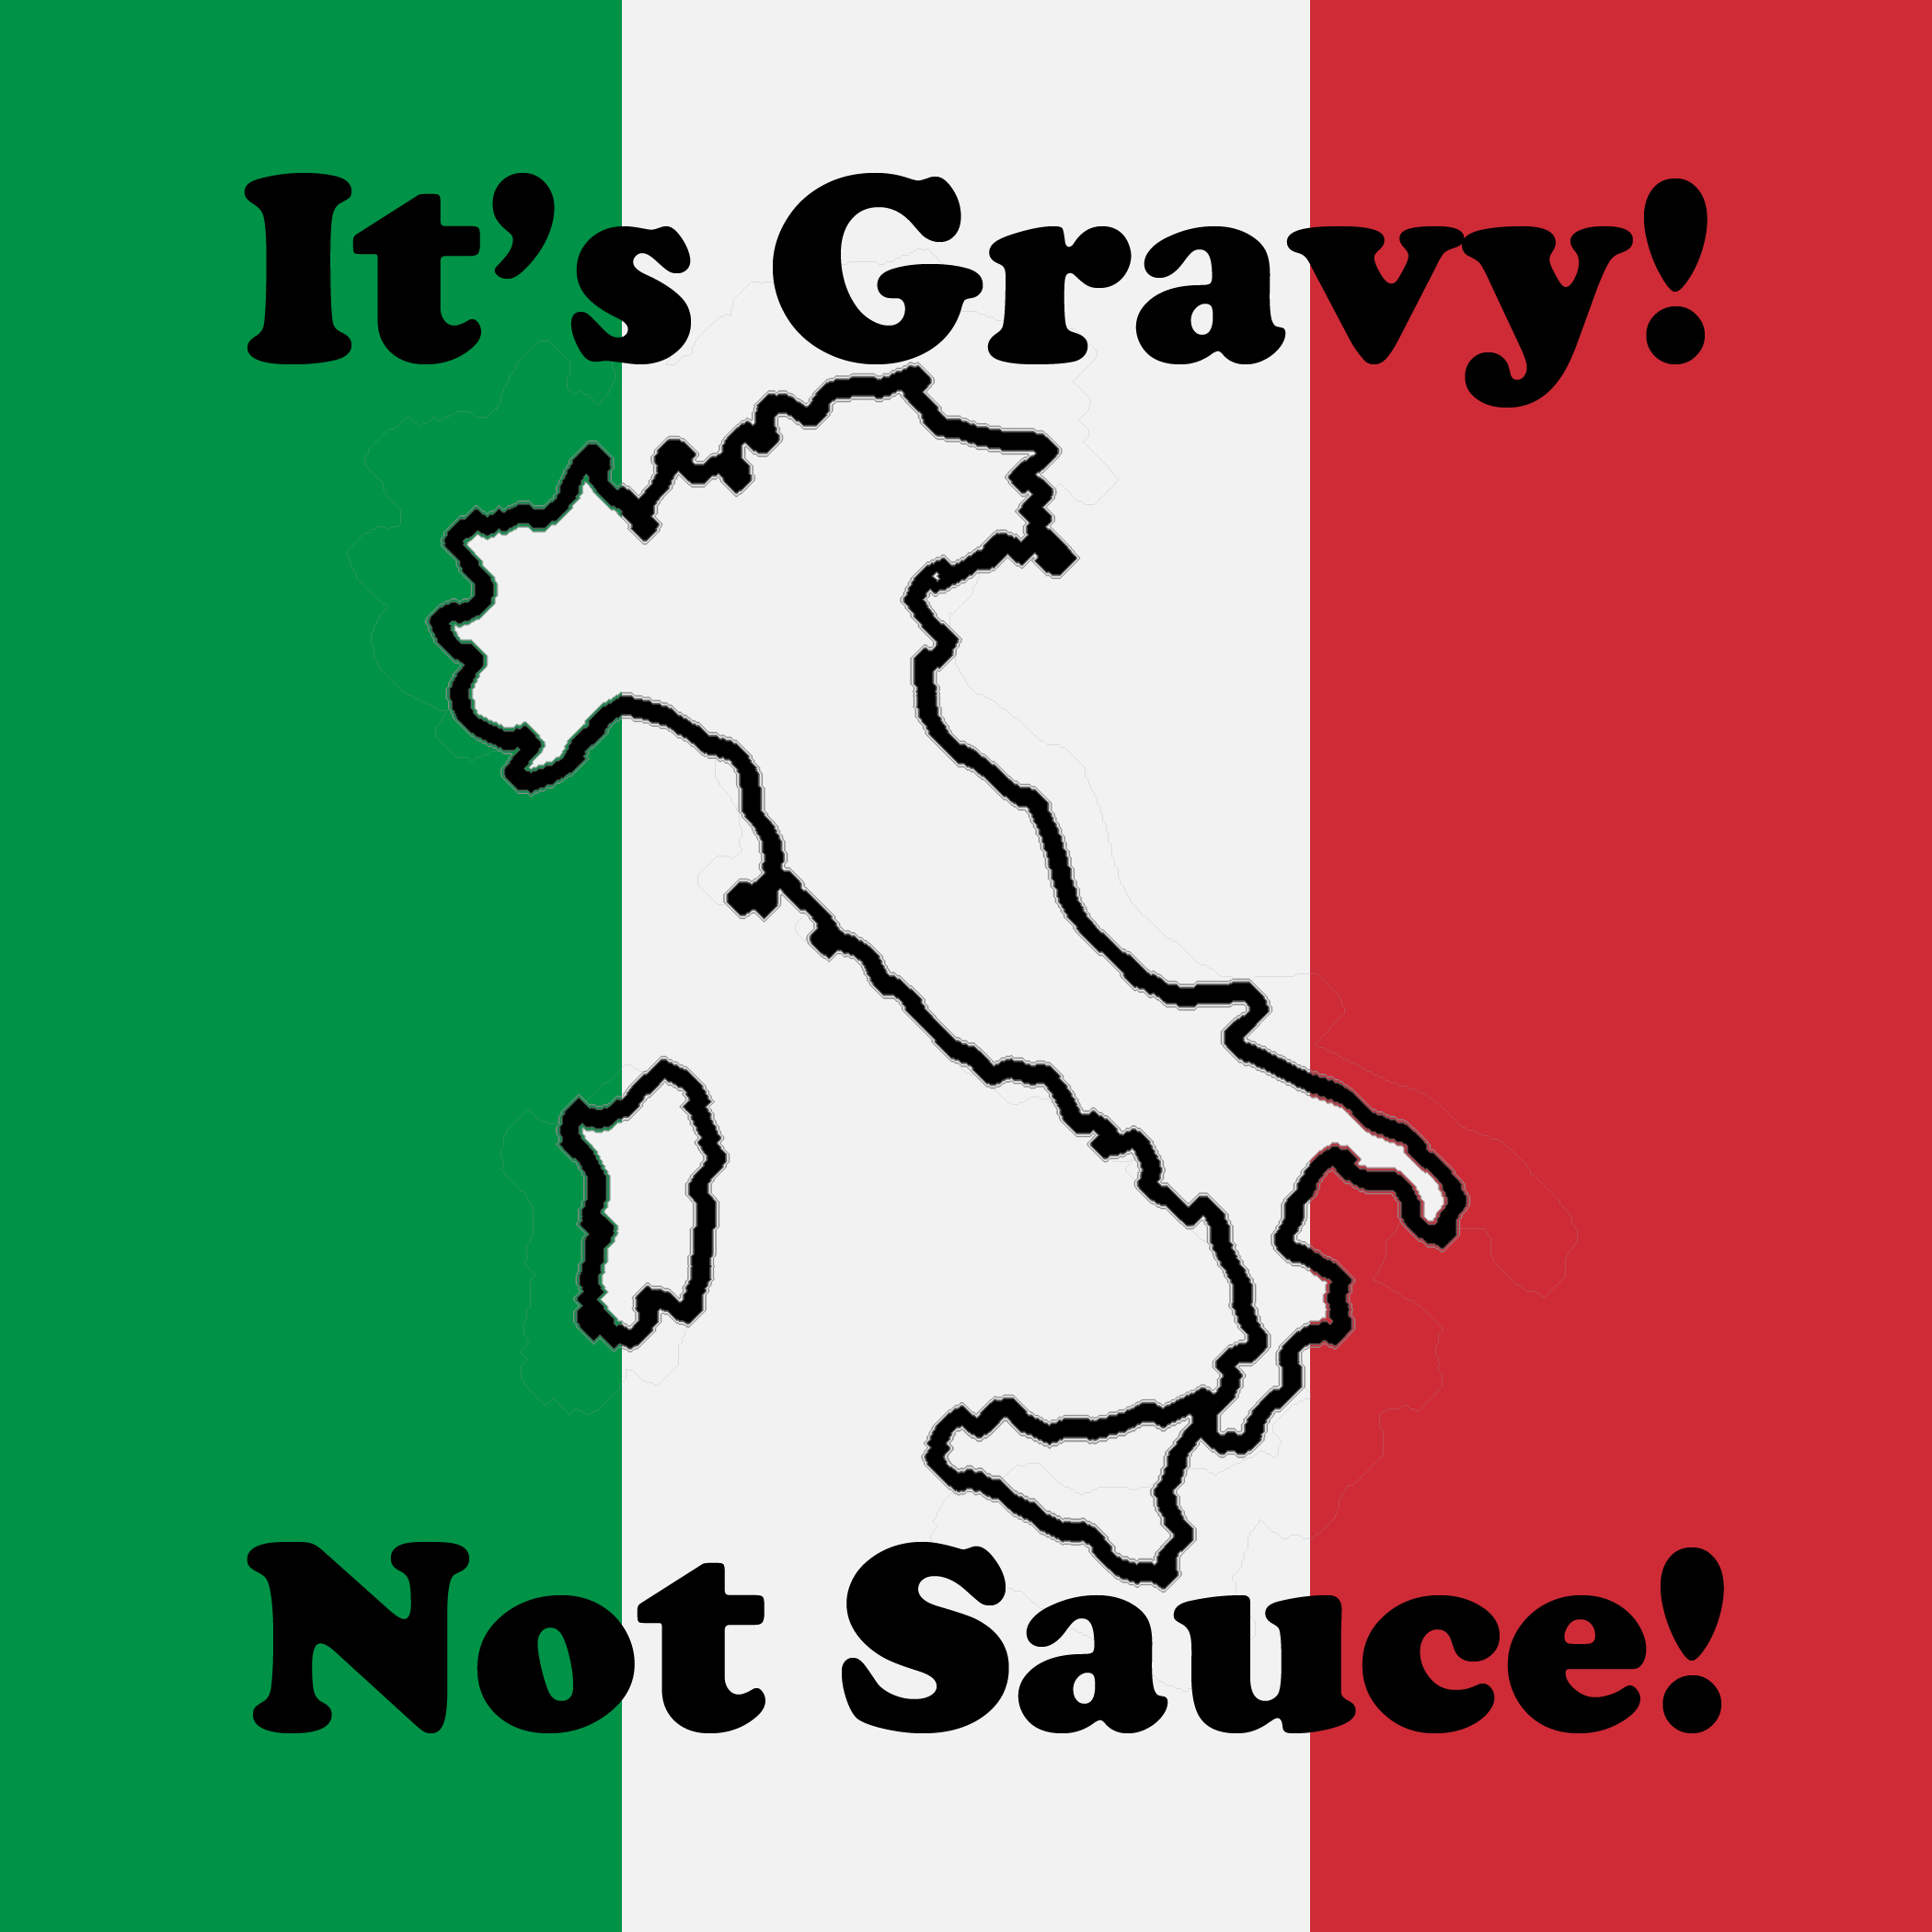 Pin by Audrey Regan on Italian | Pinterest | Google images, Italia ...